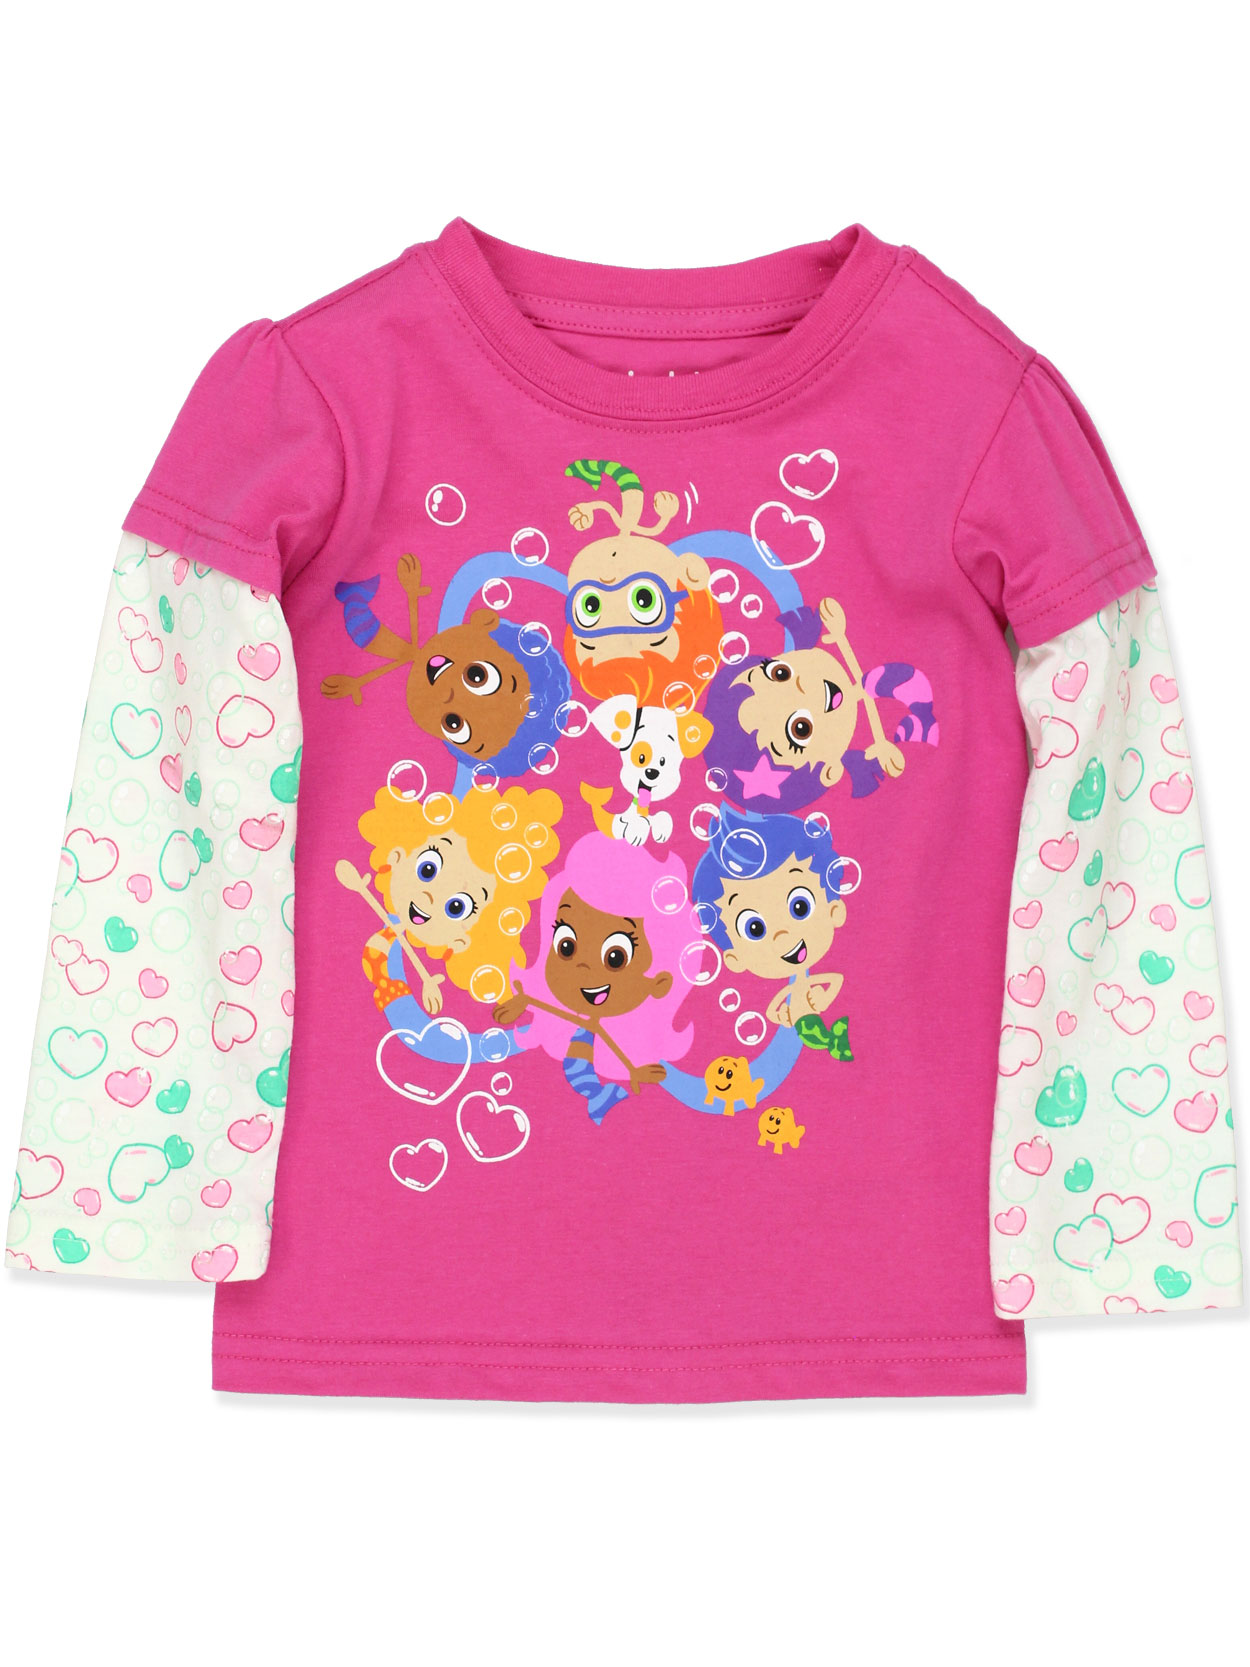 Bubble Guppies Toddler Girls Long Sleeve T-Shirt Tee ANBB706